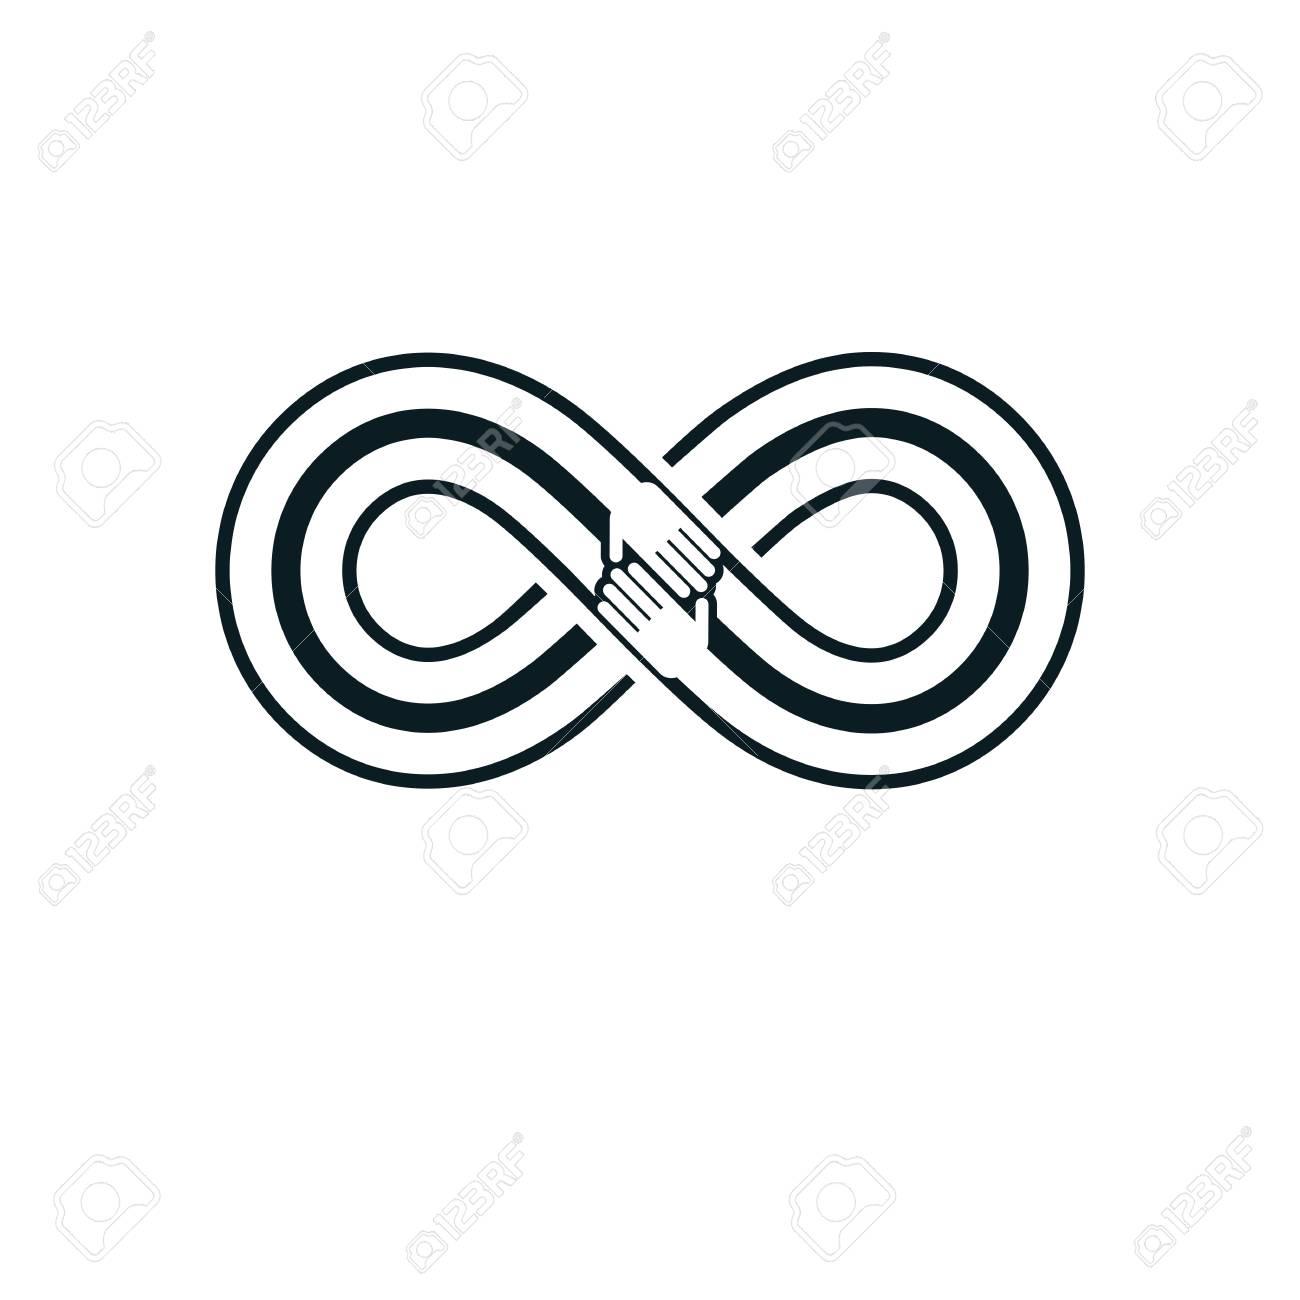 Friends forever everlasting friendship beautiful vector logo friends forever everlasting friendship beautiful vector logo combined with two symbols of eternity loop biocorpaavc Images